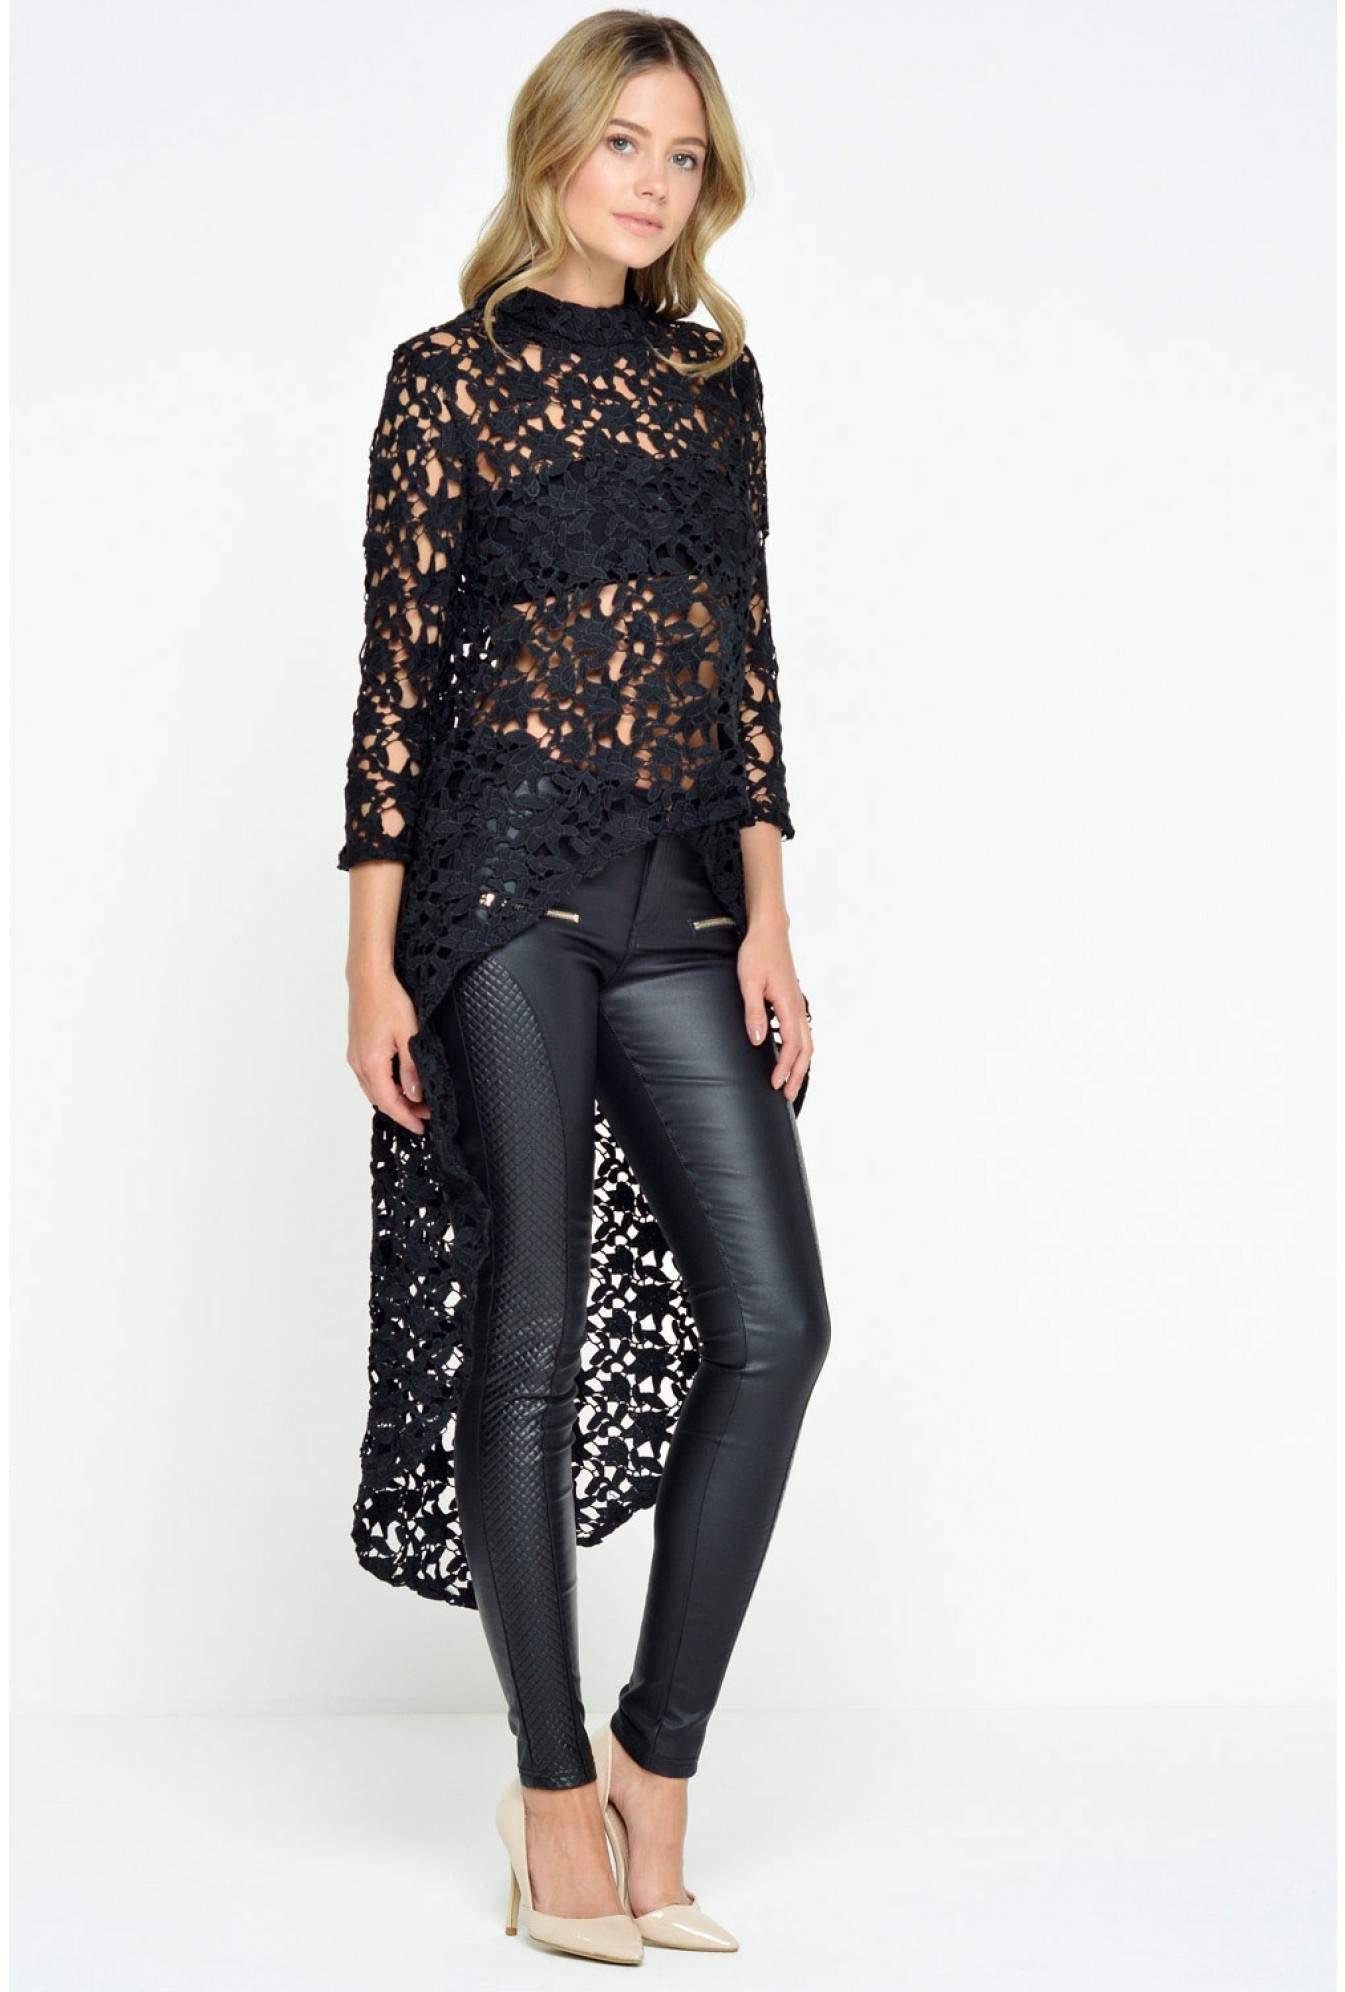 f714c2244e674 Paris Amelia Dipped Hem Crochet Top in Black | iCLOTHING